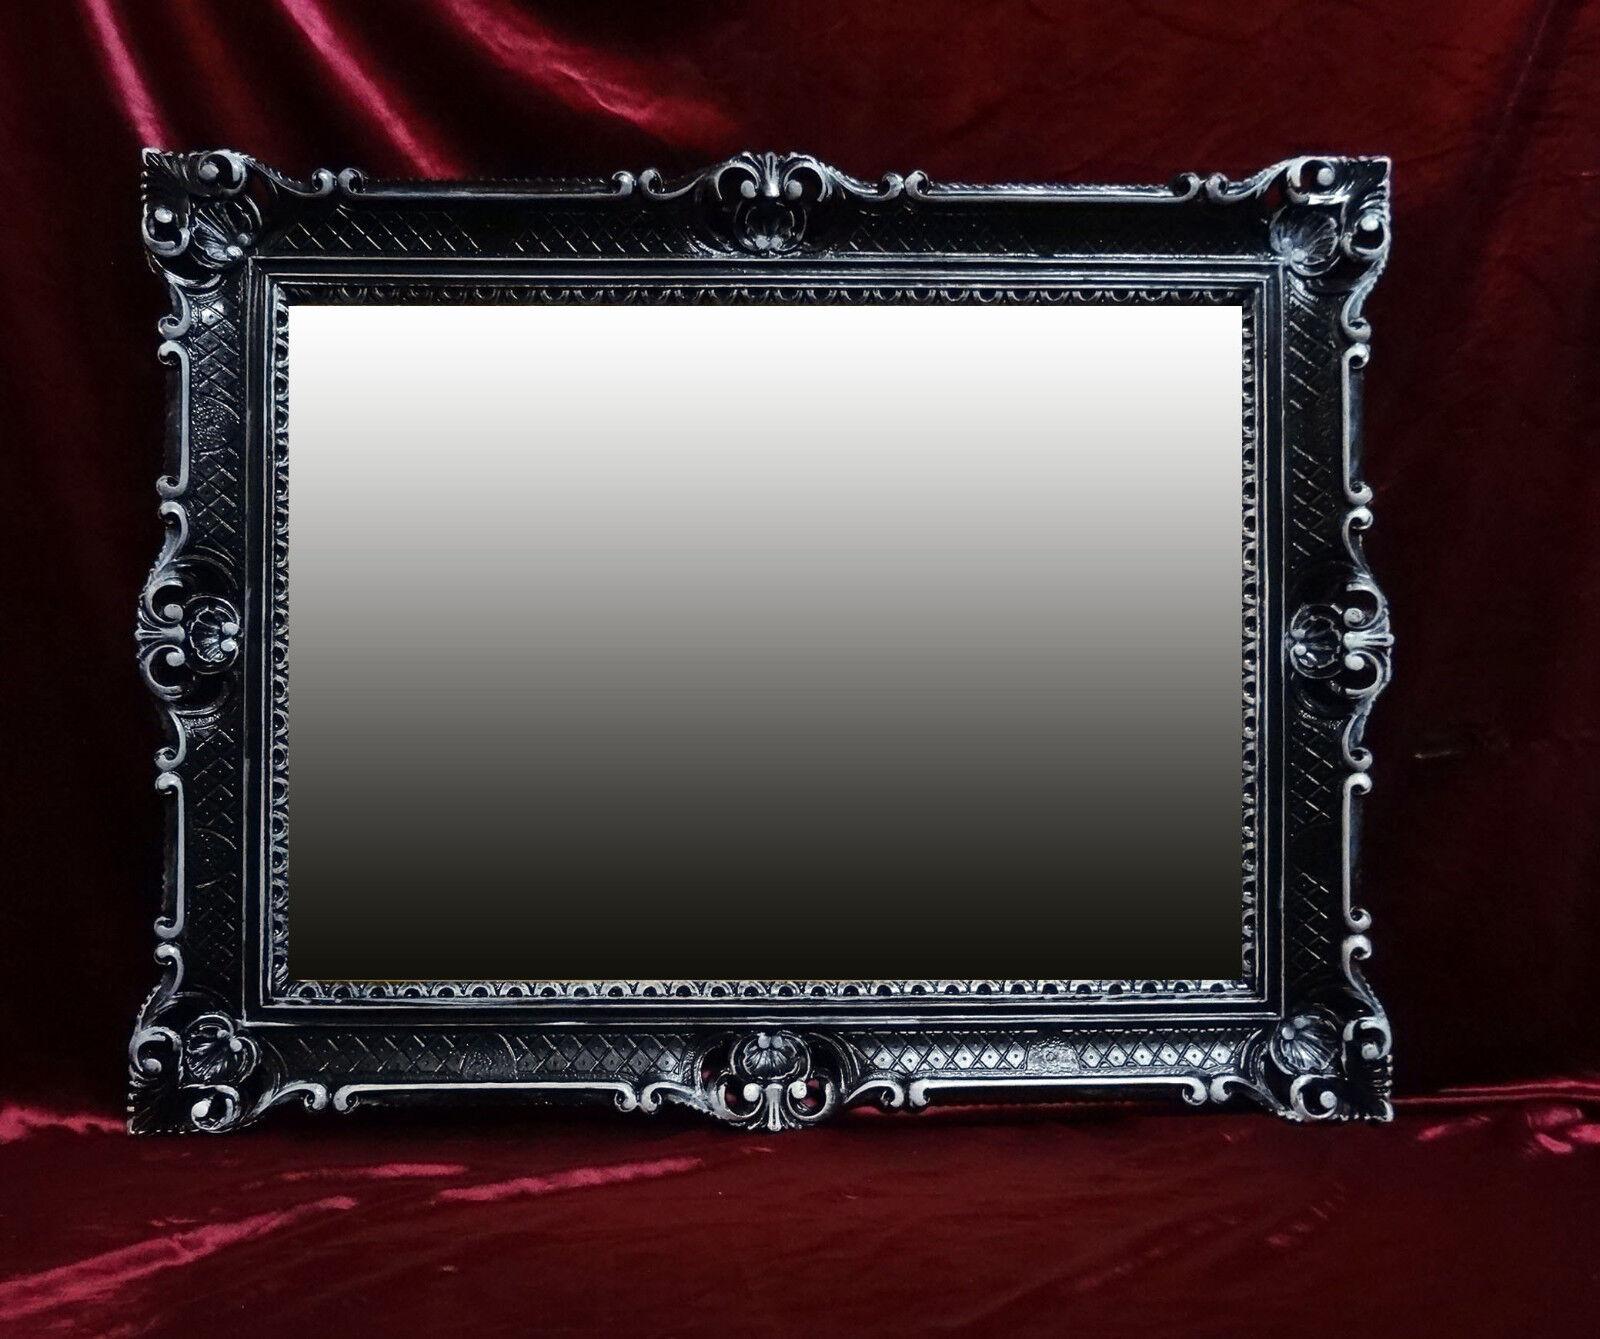 MIROIR MURAL NOIR BLANC ANTIQUE BAROQUE ROCOCO 90x70 cm décoration REPRO